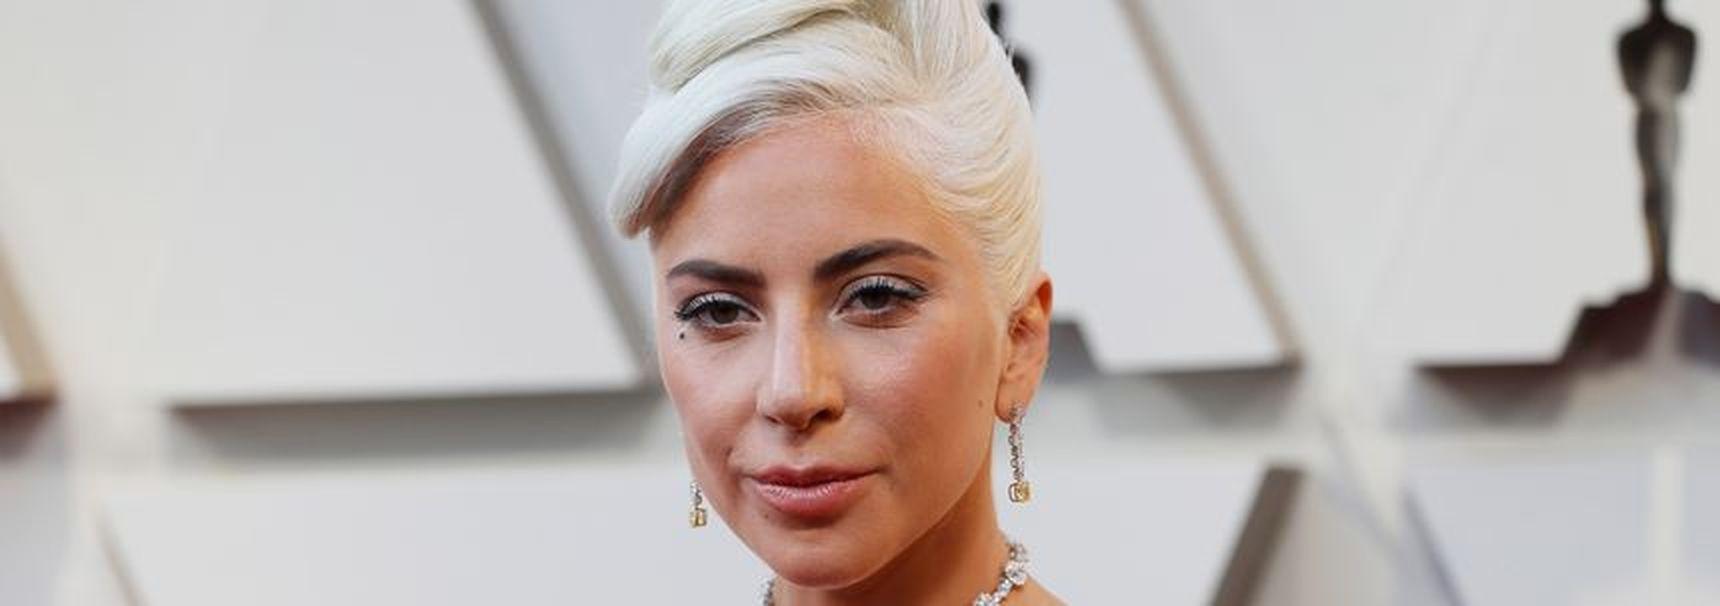 Gaga ooh-la-la: Oreo en Lady Gaga komen met een limited edition smaak – Culy.nl